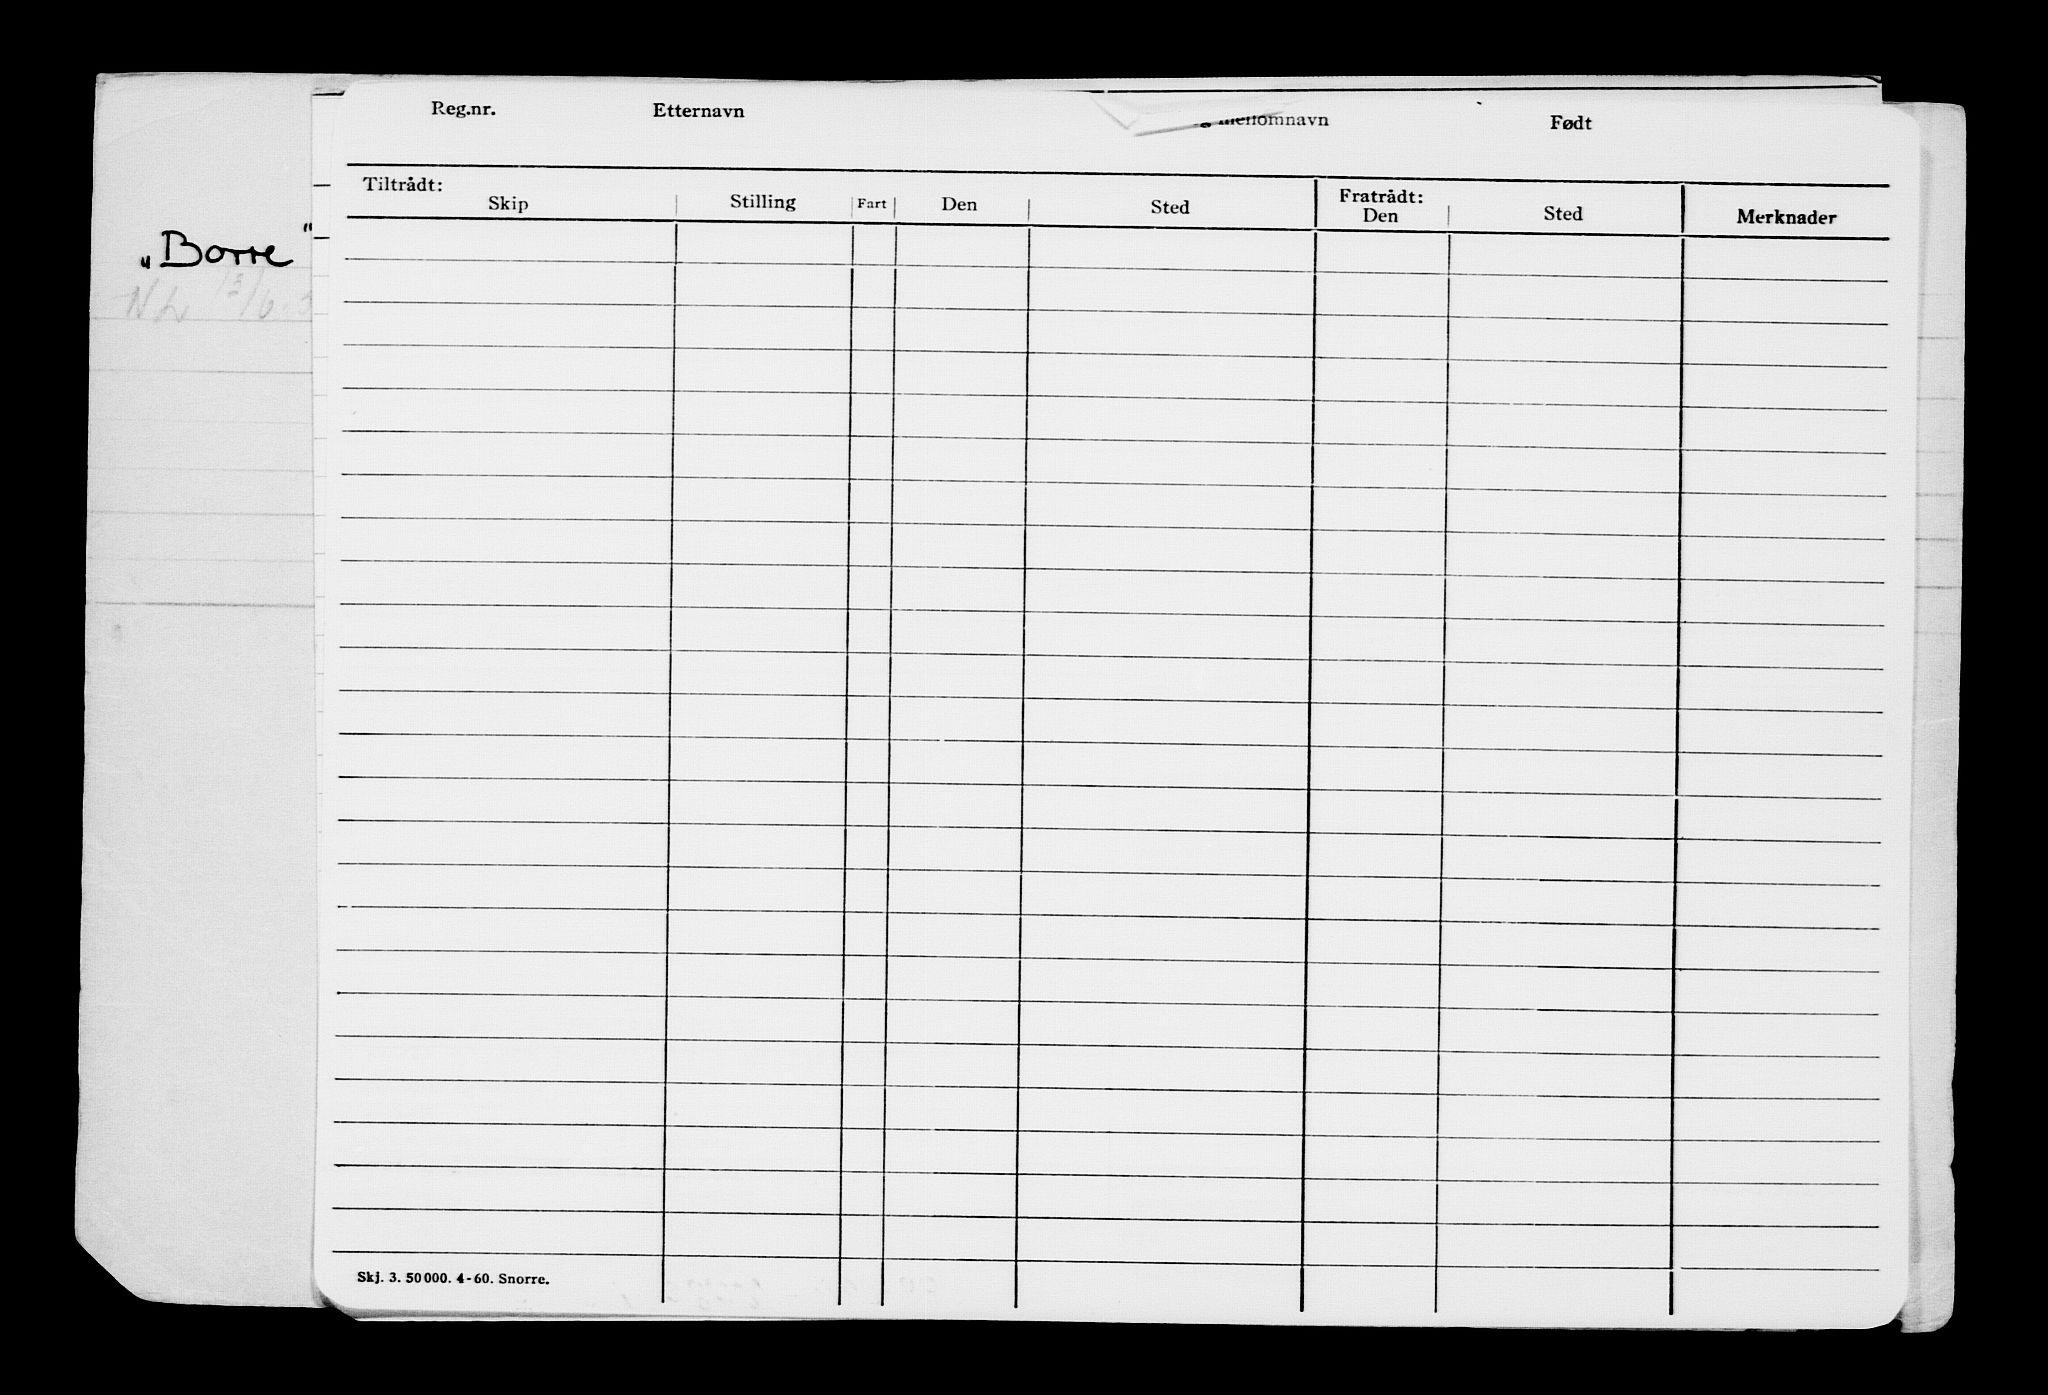 RA, Direktoratet for sjømenn, G/Gb/L0045: Hovedkort, 1902, s. 471